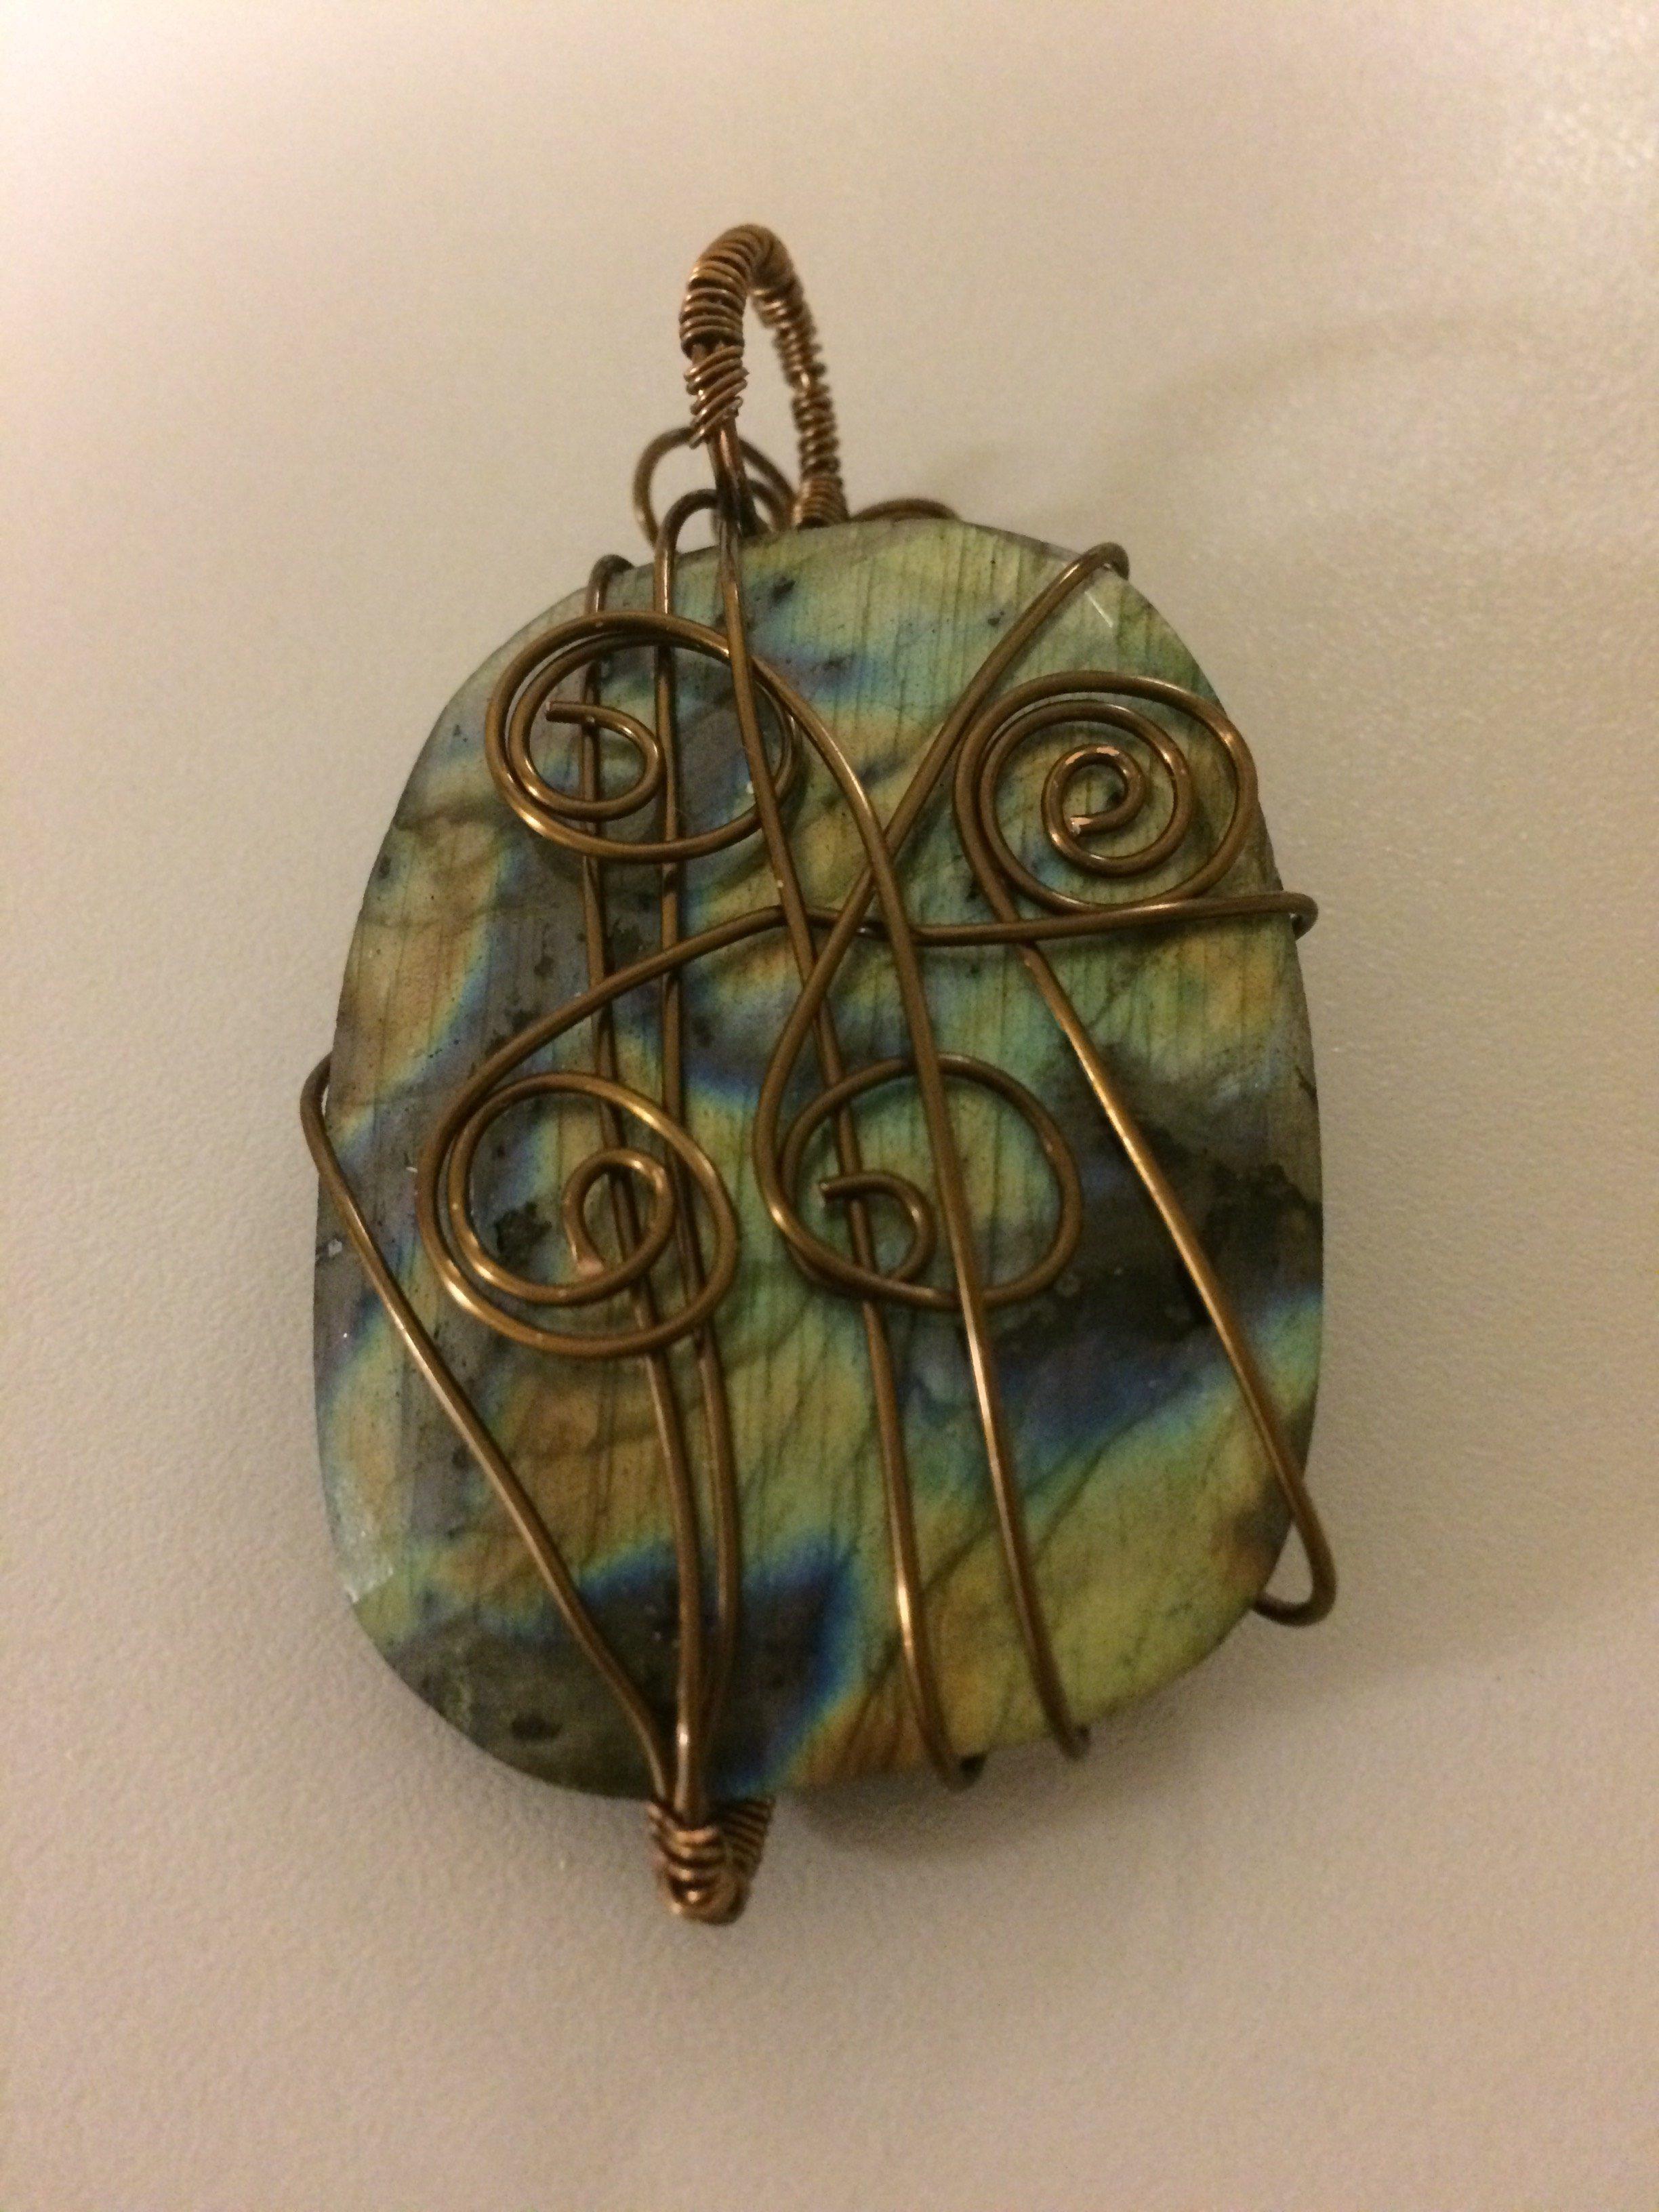 Labradorite Antique Brass Wire-Wrapped Pendant